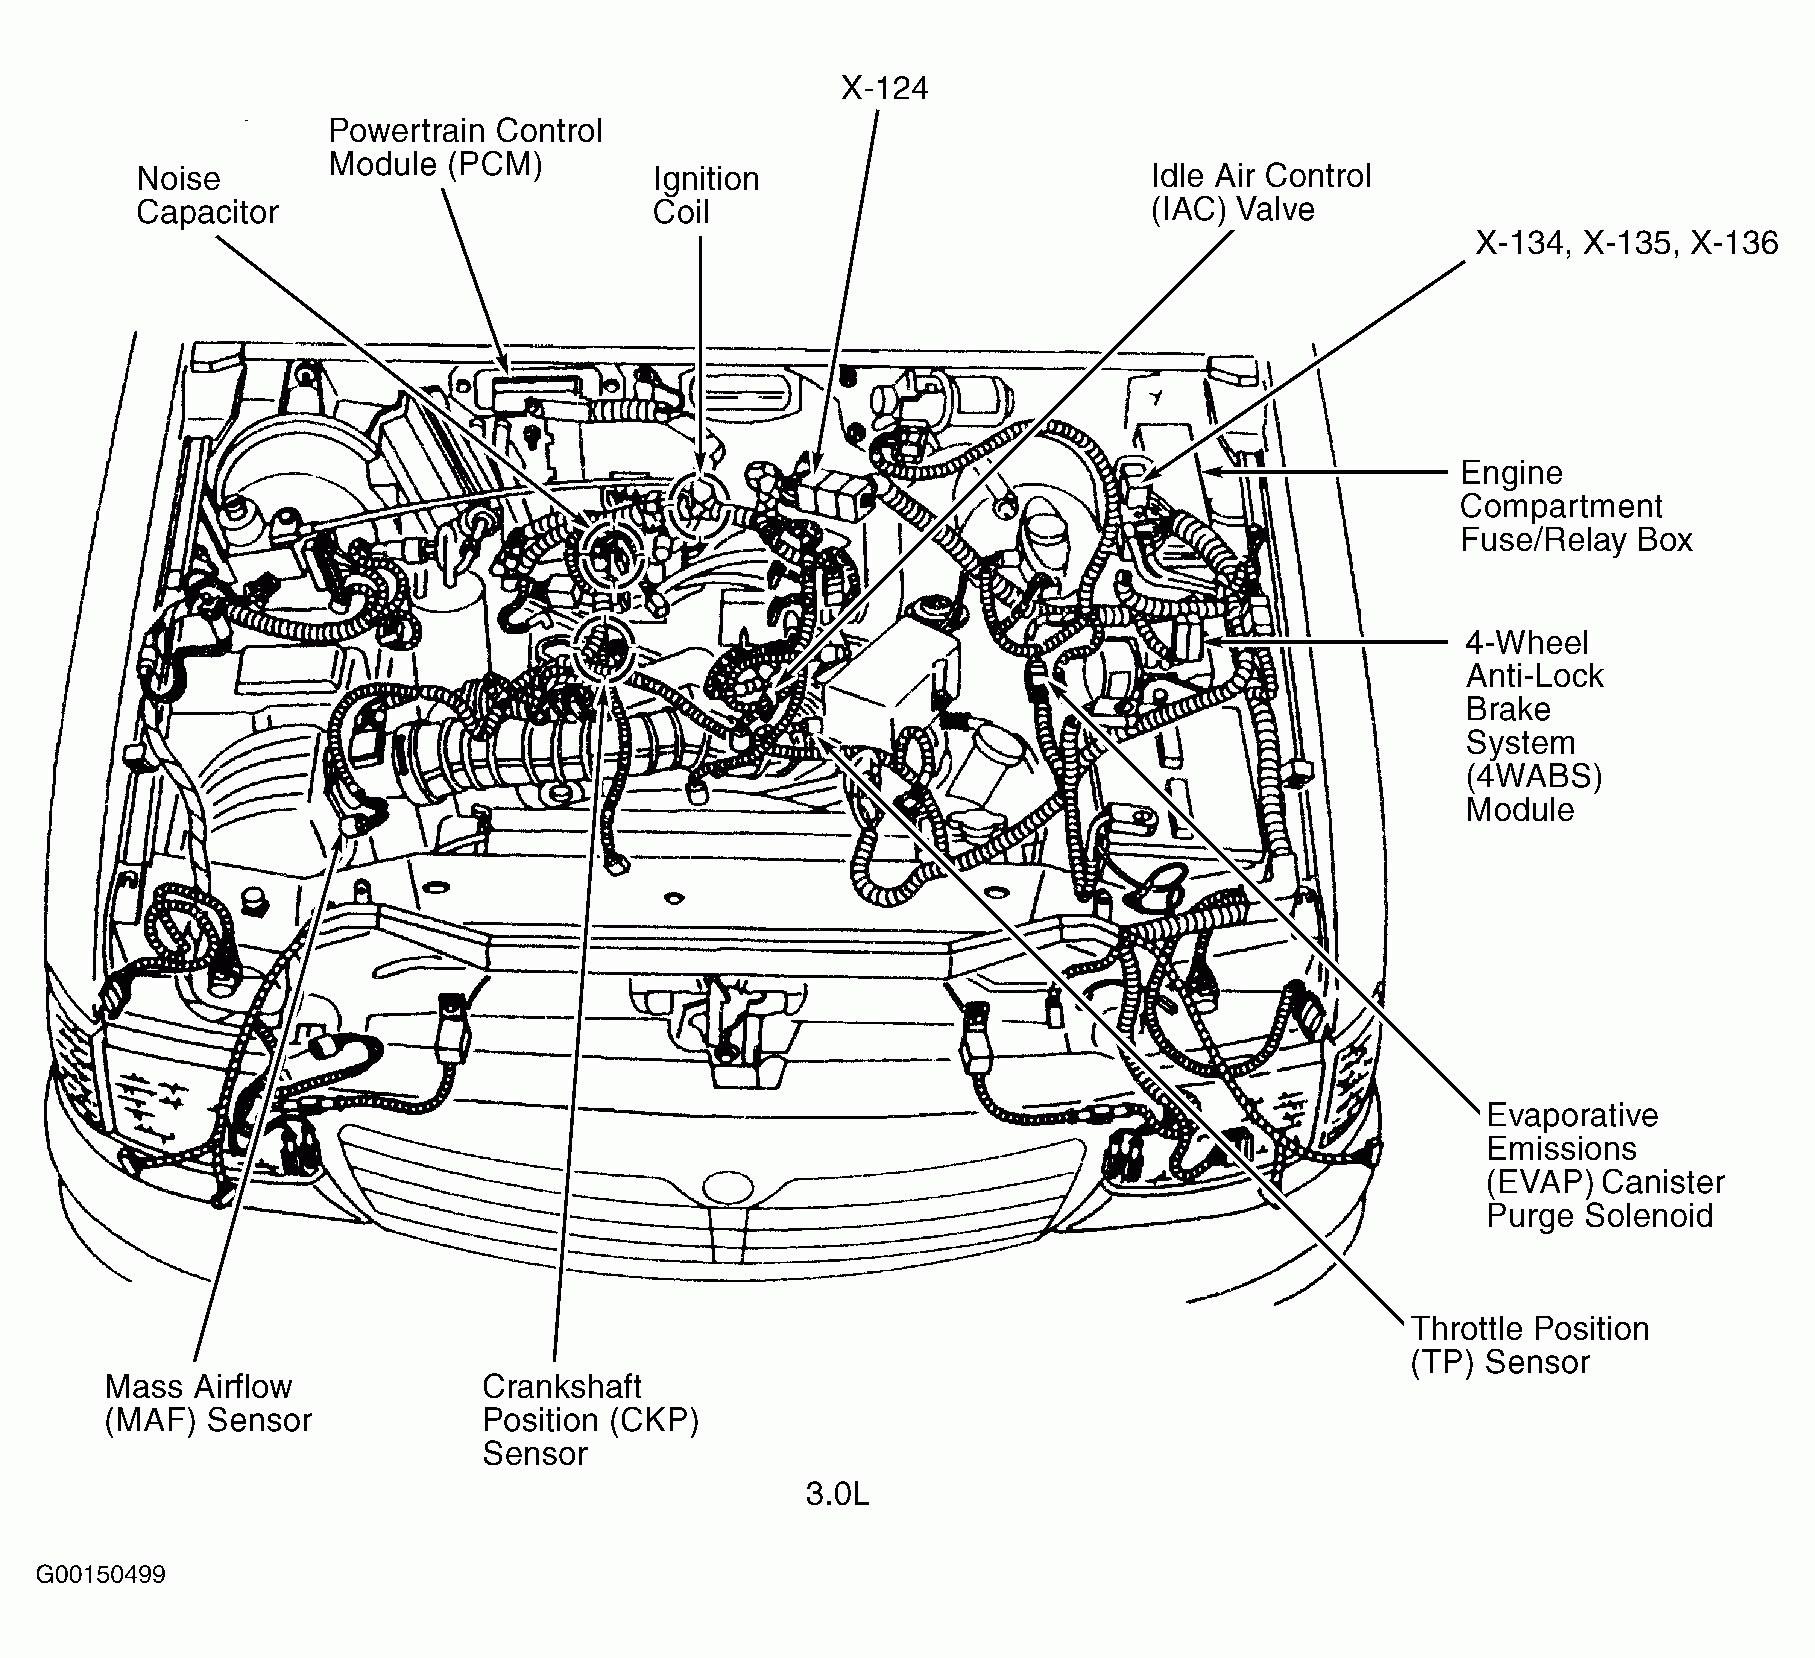 2010    Chevy Aveo Engine    Diagram      My    Wiring       DIagram